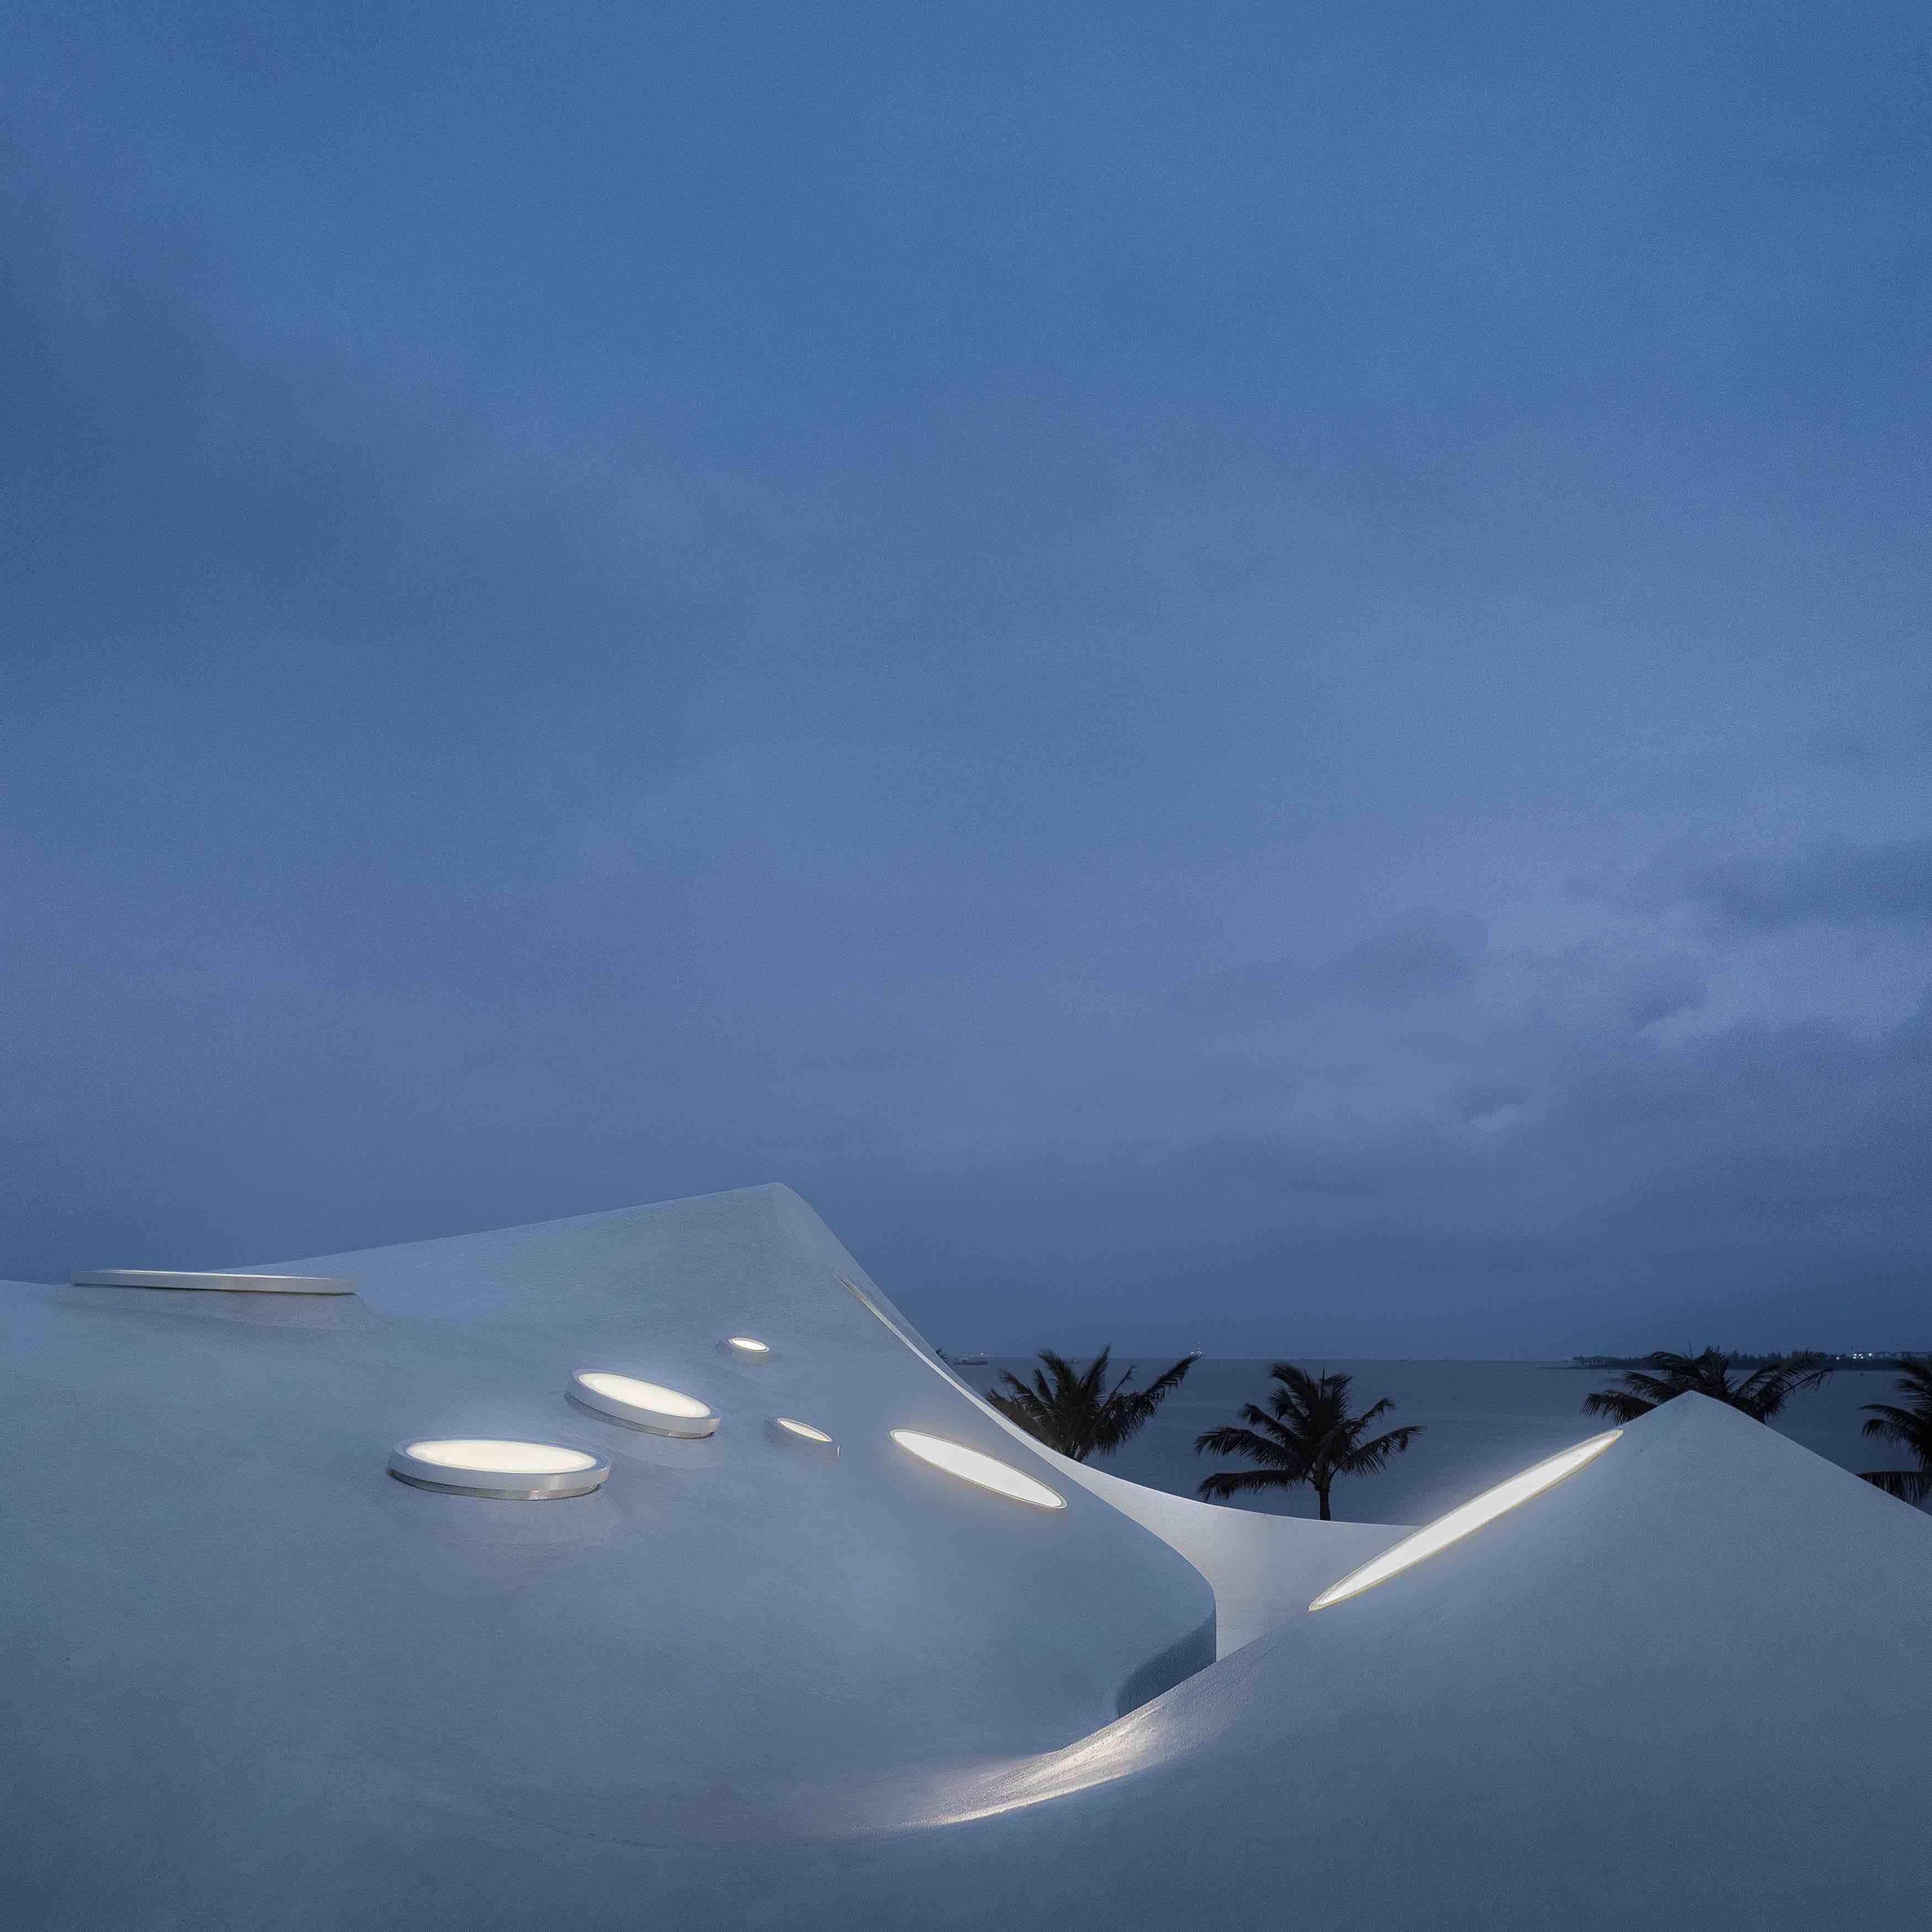 建筑雕塑感极强 CreatAR Images图